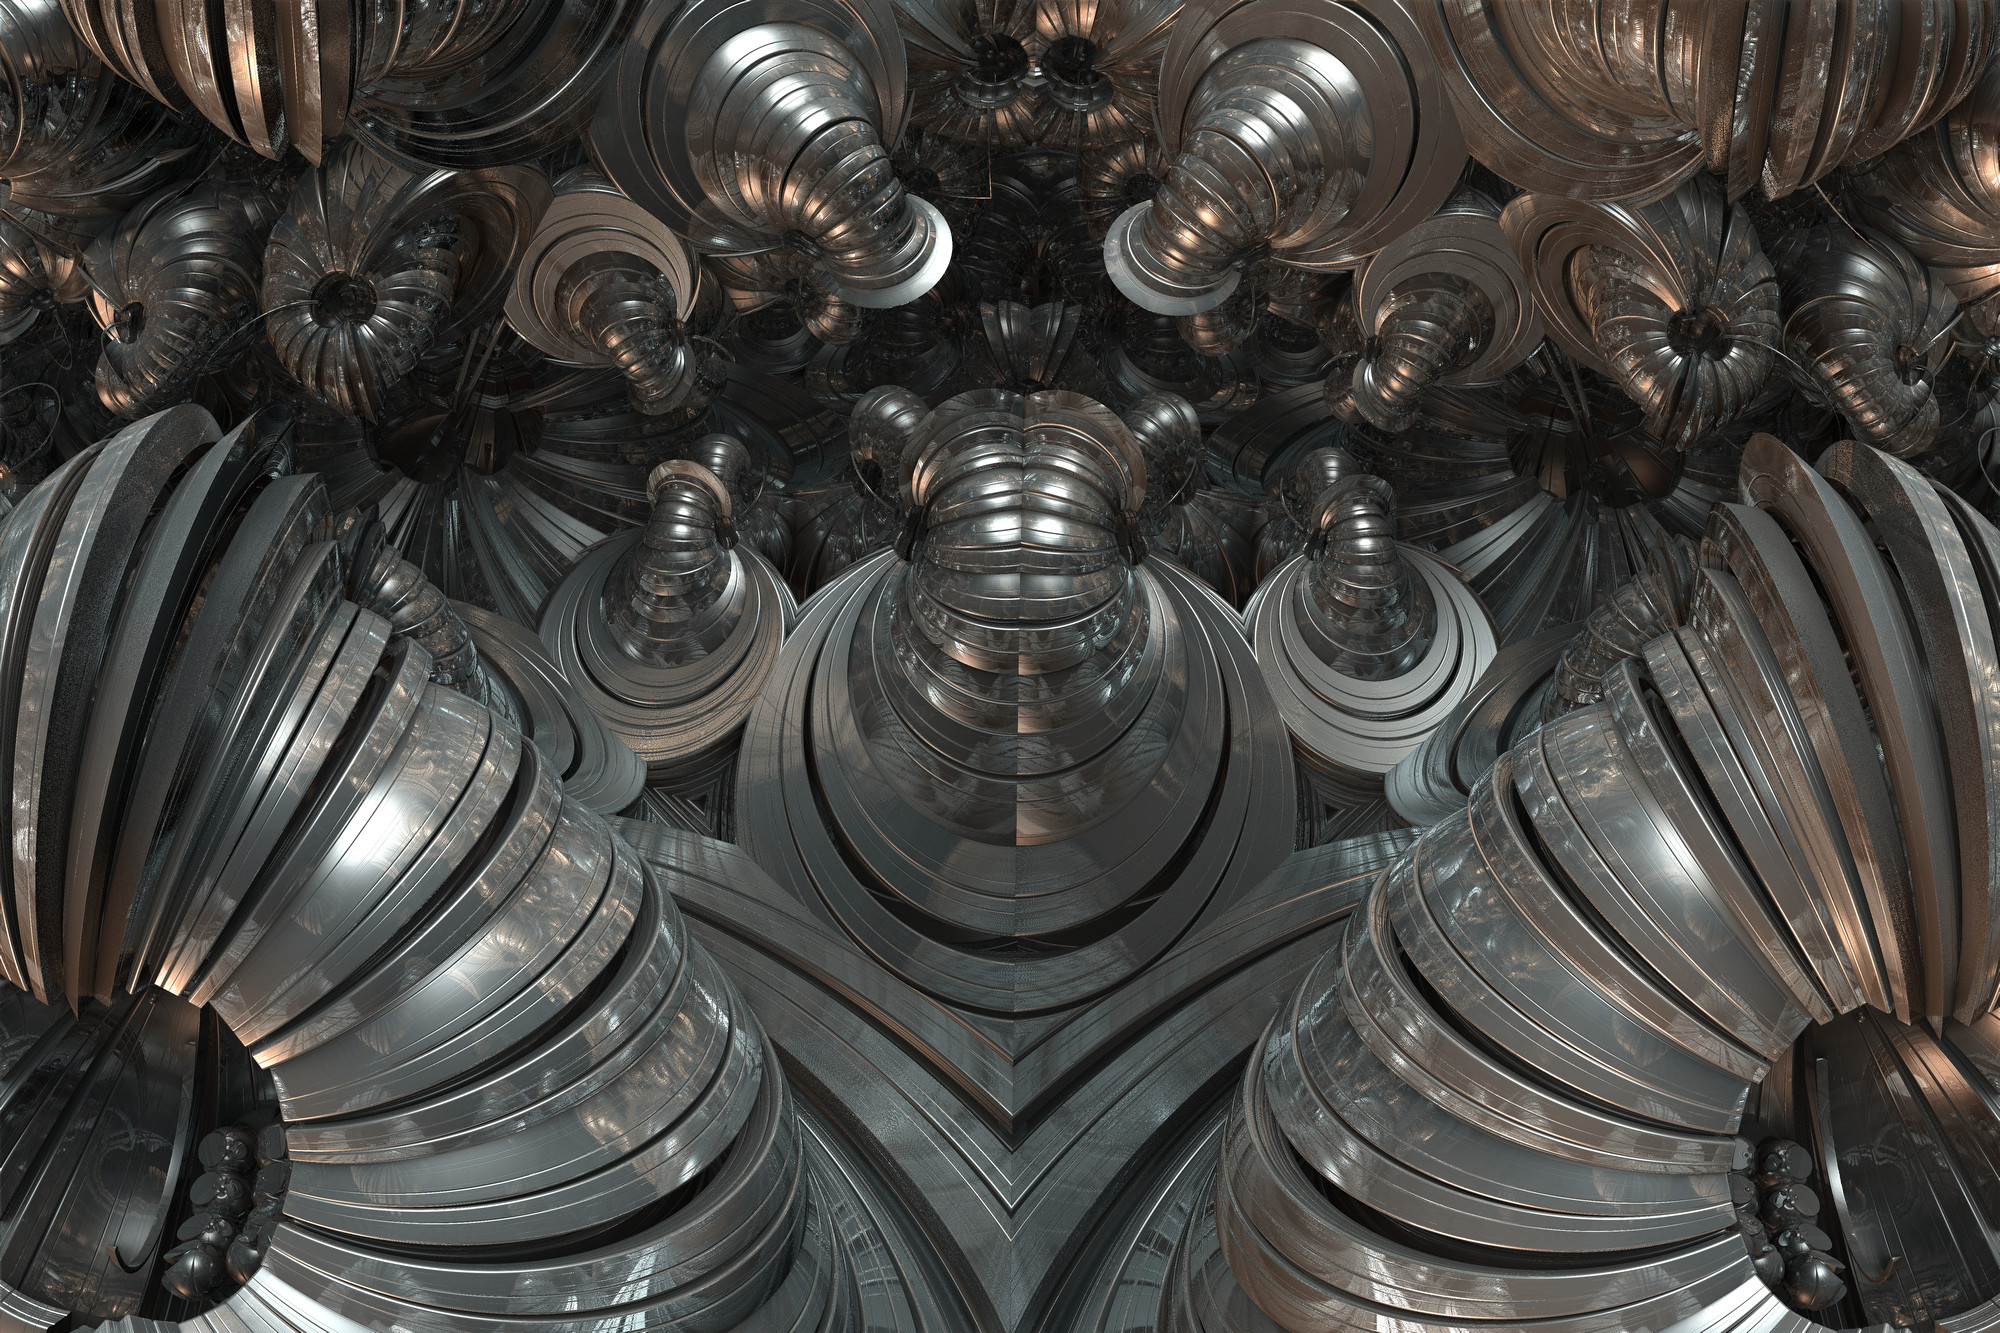 Chrome Snails by GrahamSym